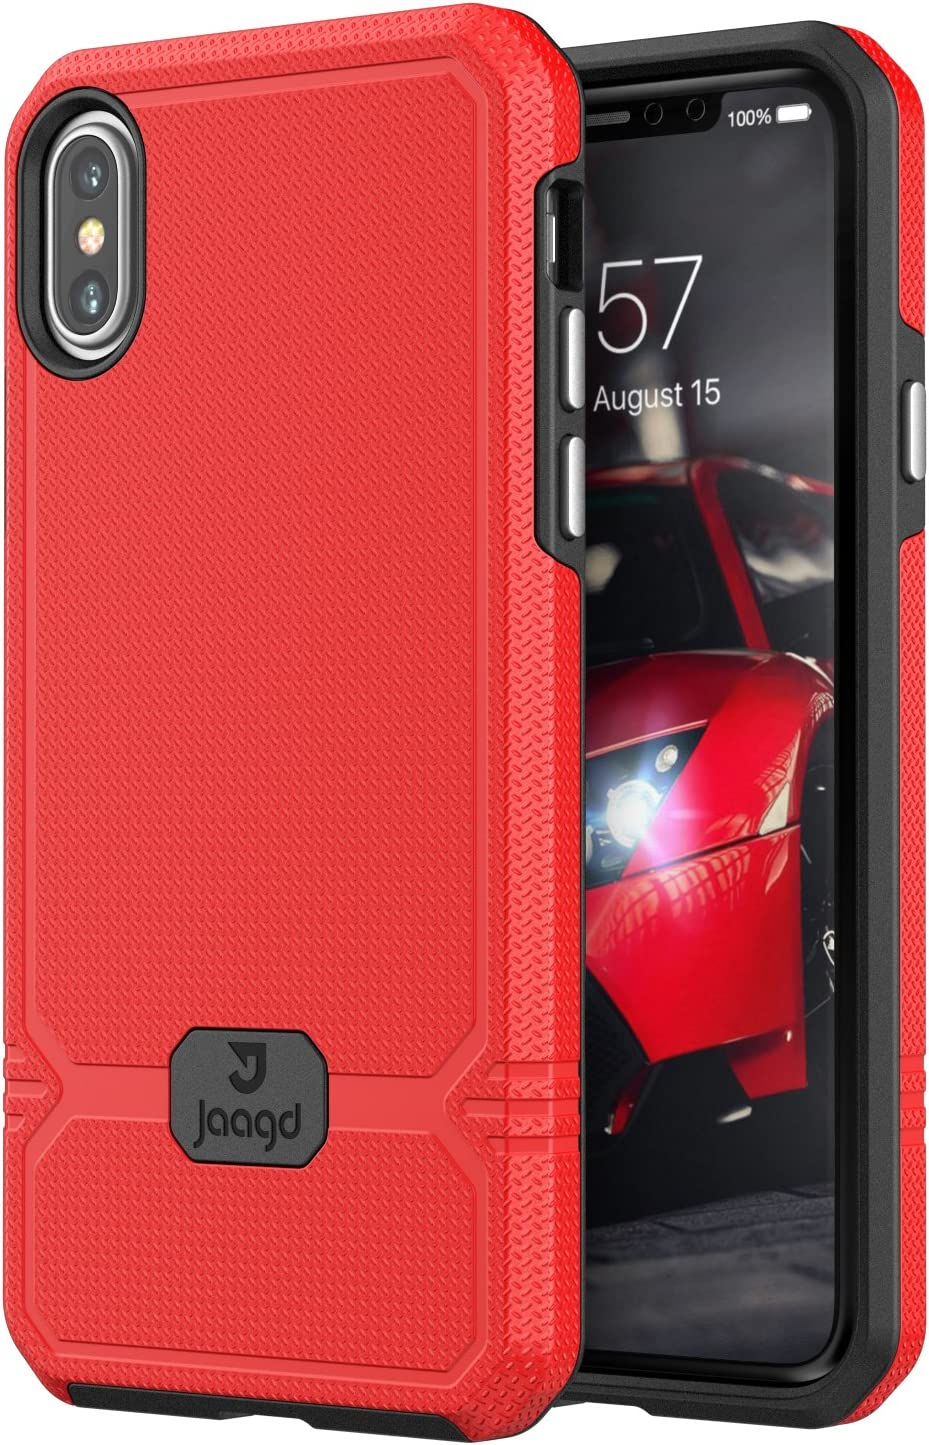 Jaagd iPhone X Case, iPhone 10 Case, Slim Shock-absorbing Modern Slim Non-slip Grip Cell Phone Case (Red)